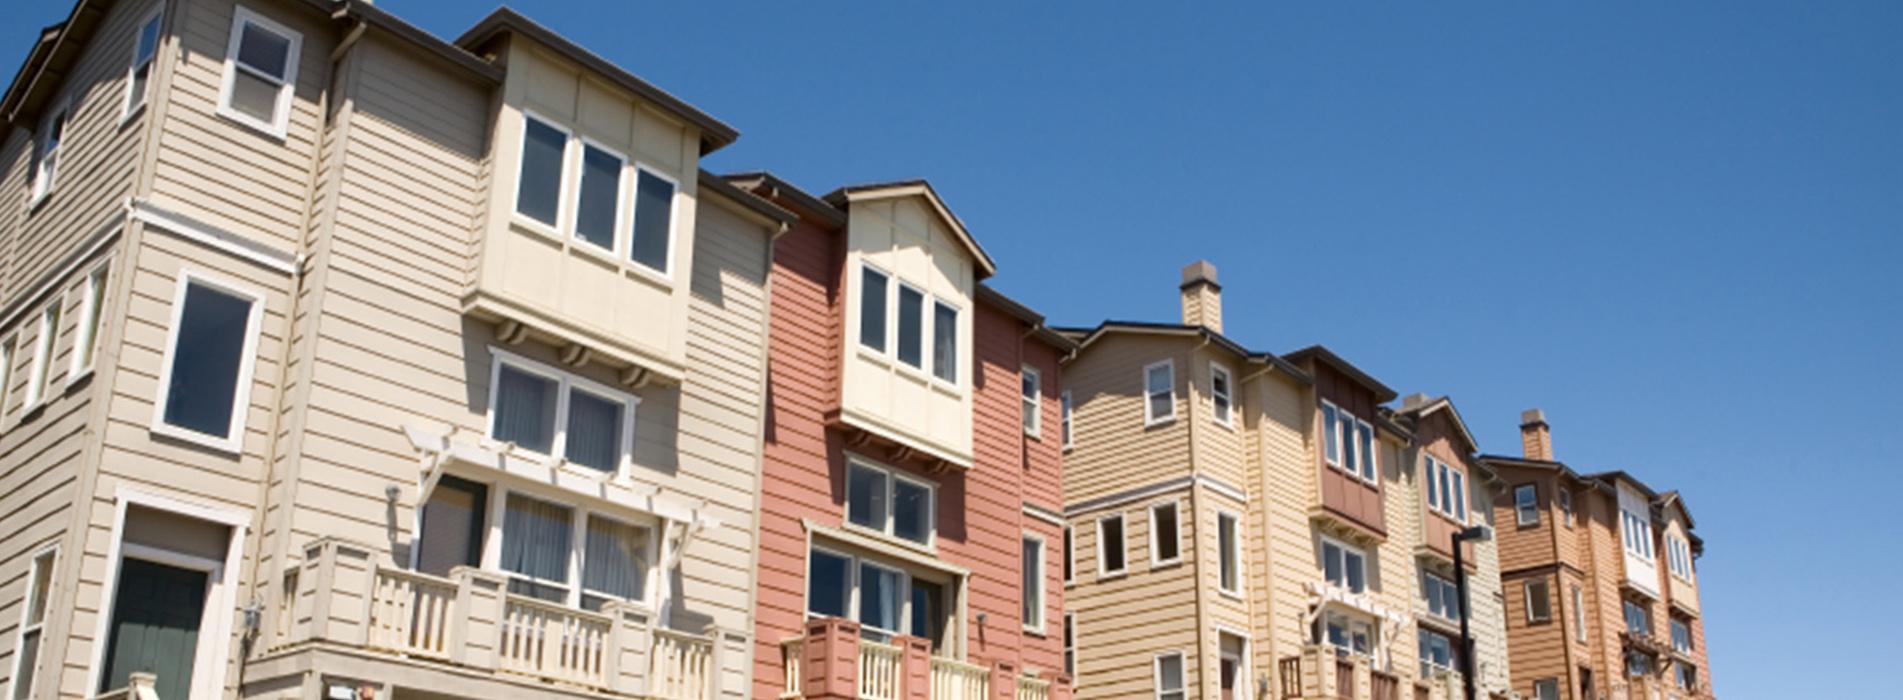 Home Renters Insurance >> Hutchinson Ks Renters Insurance Agents Dj Kauffman Agency Inc